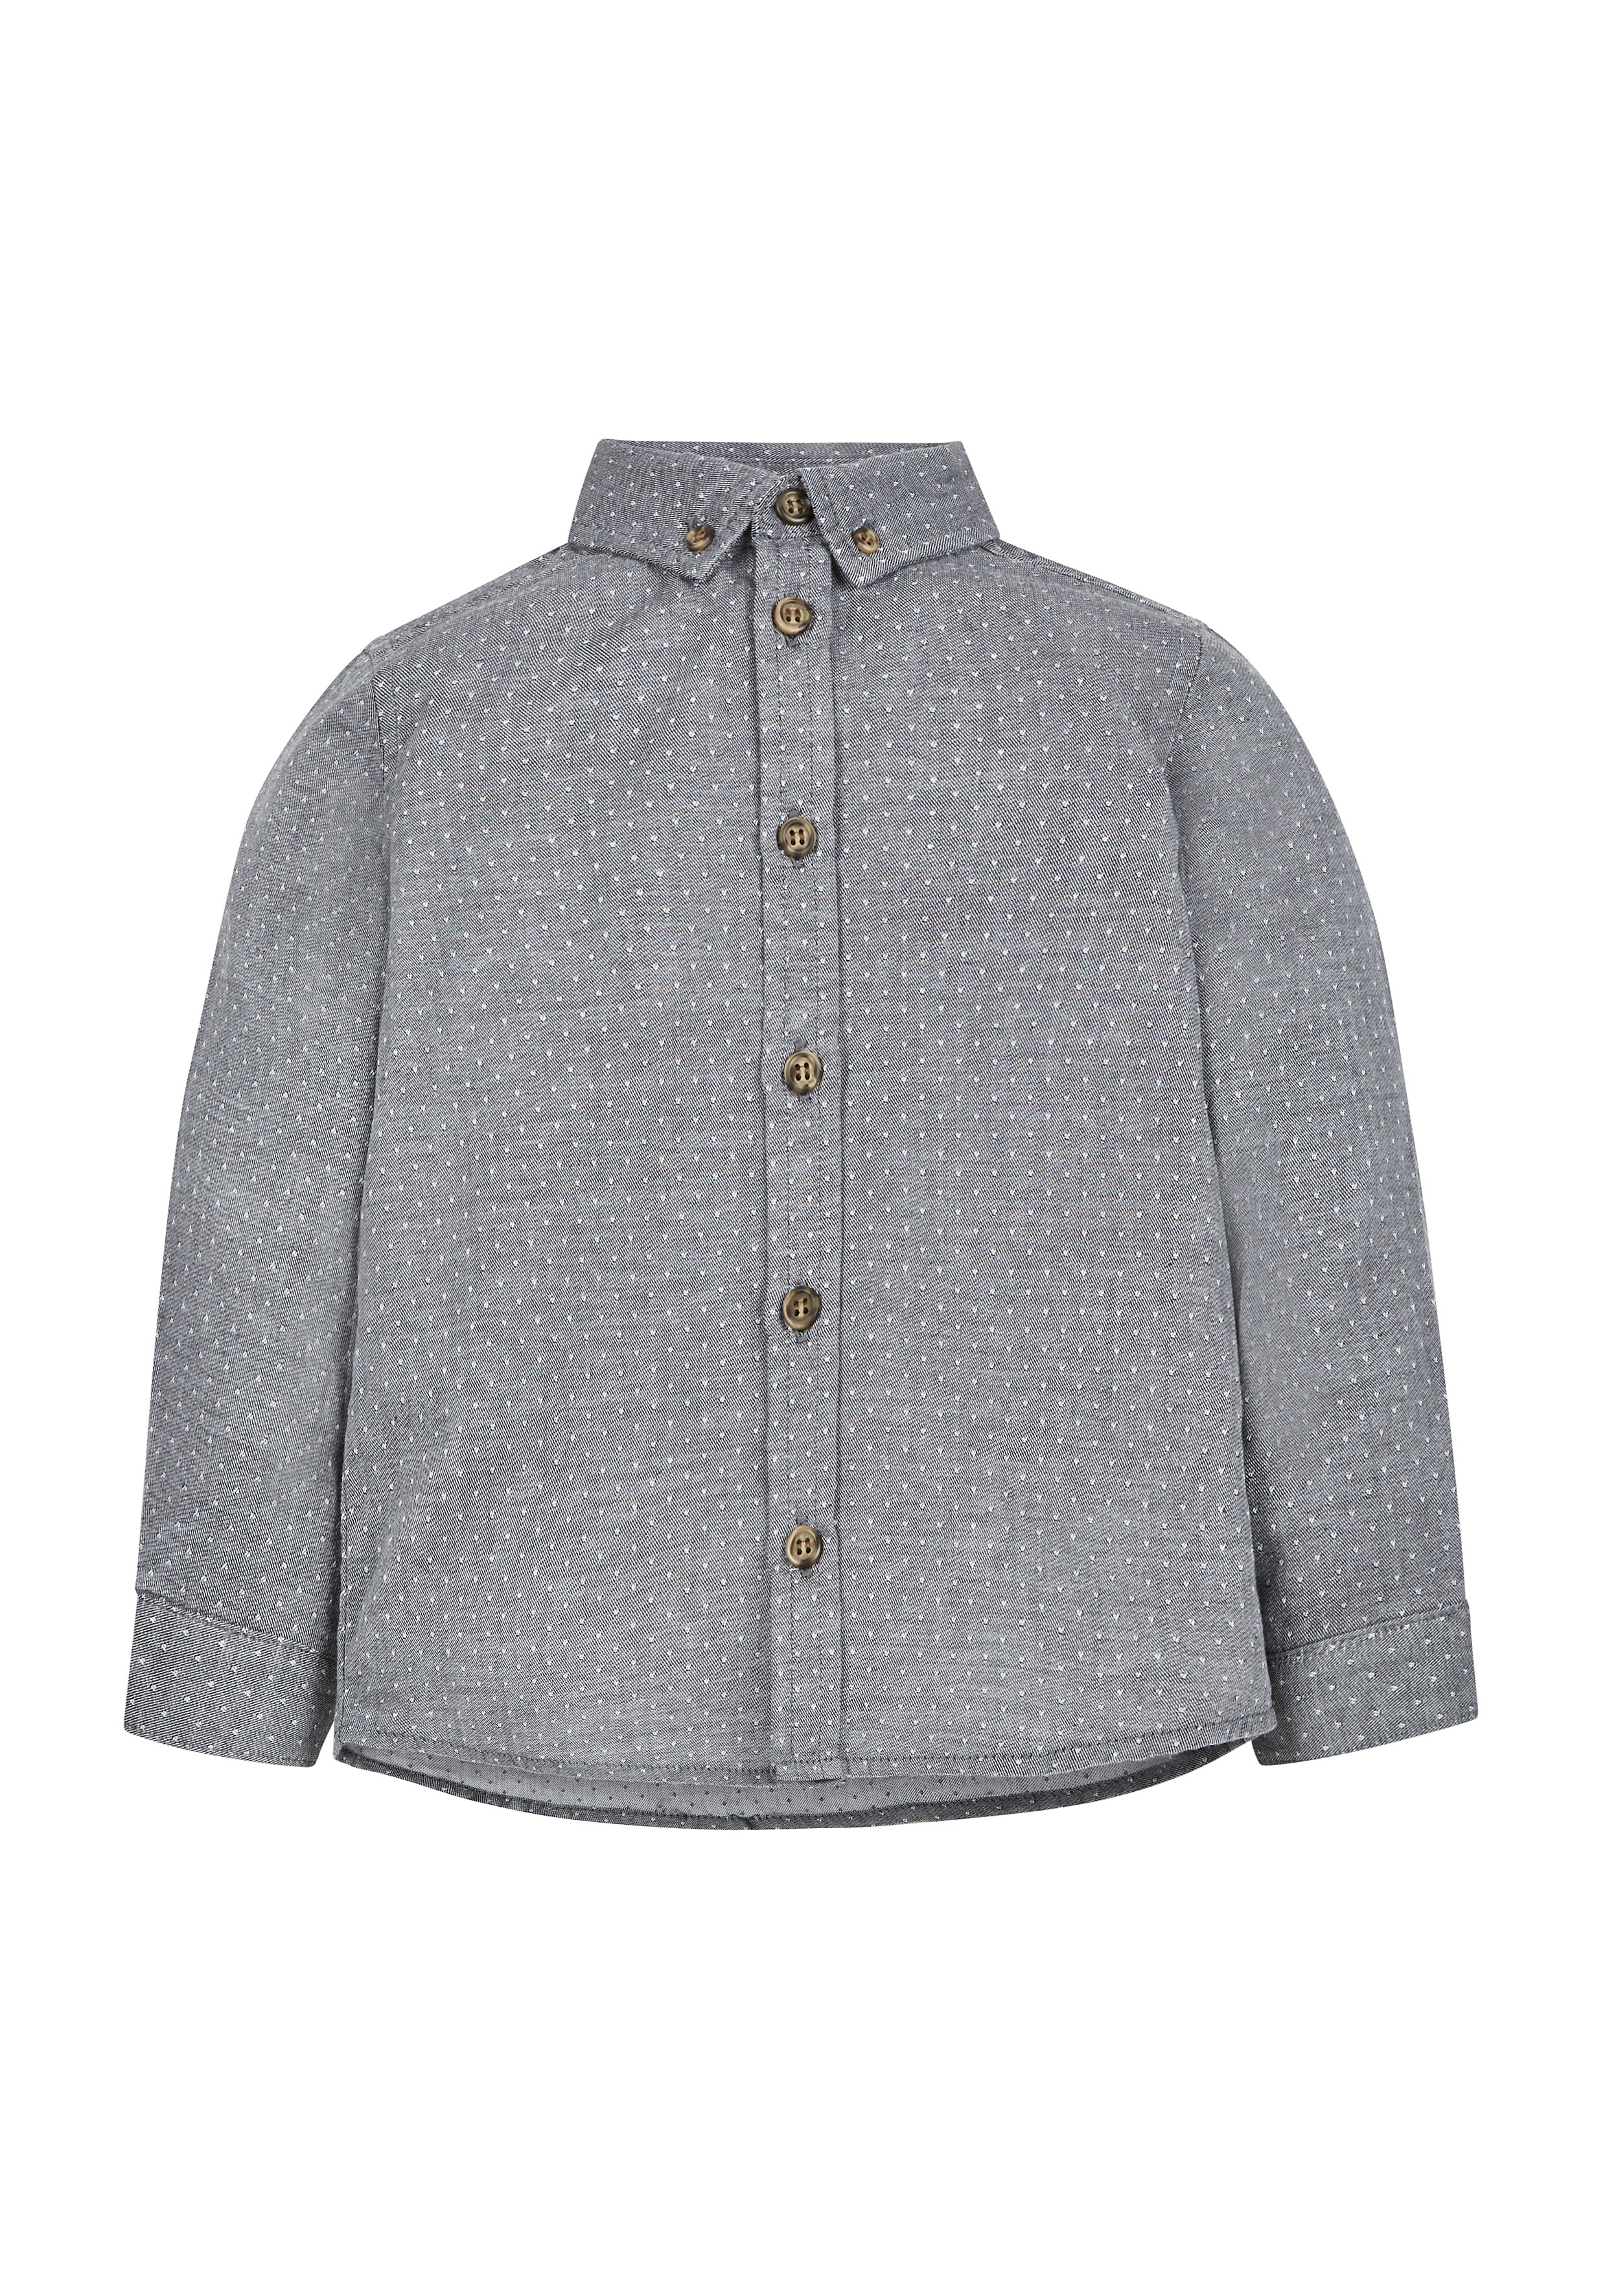 Mothercare   Boys Dobby Shirt - Grey